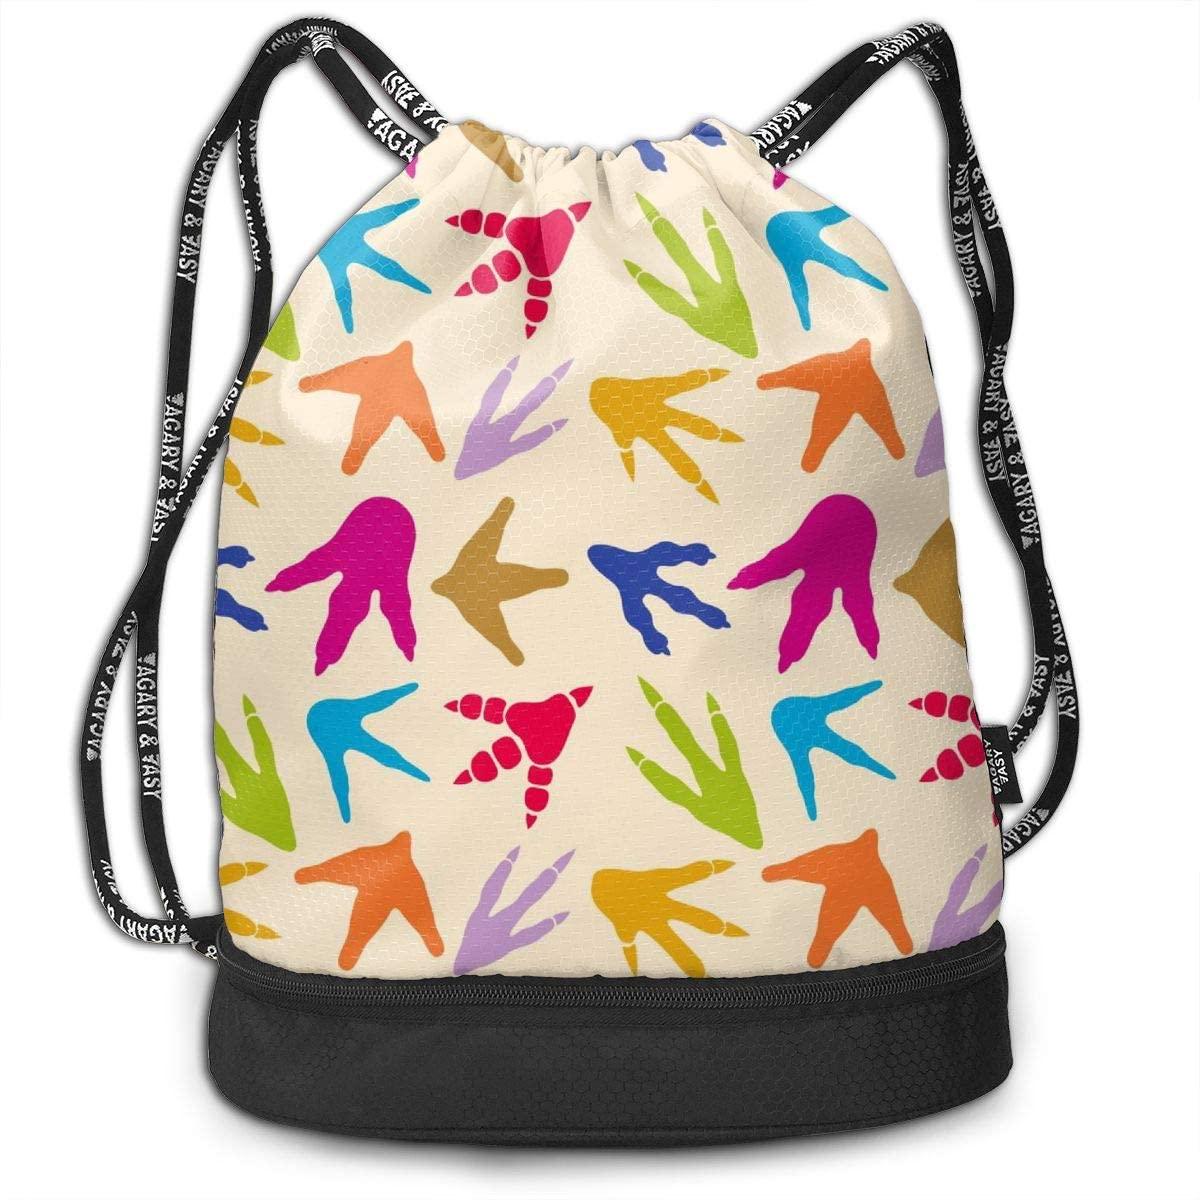 Bundle Backpacks Dinosaur Footprints Gym Sack Drawstring Bags Casual Daypack Yoga Bag School Training Pouch